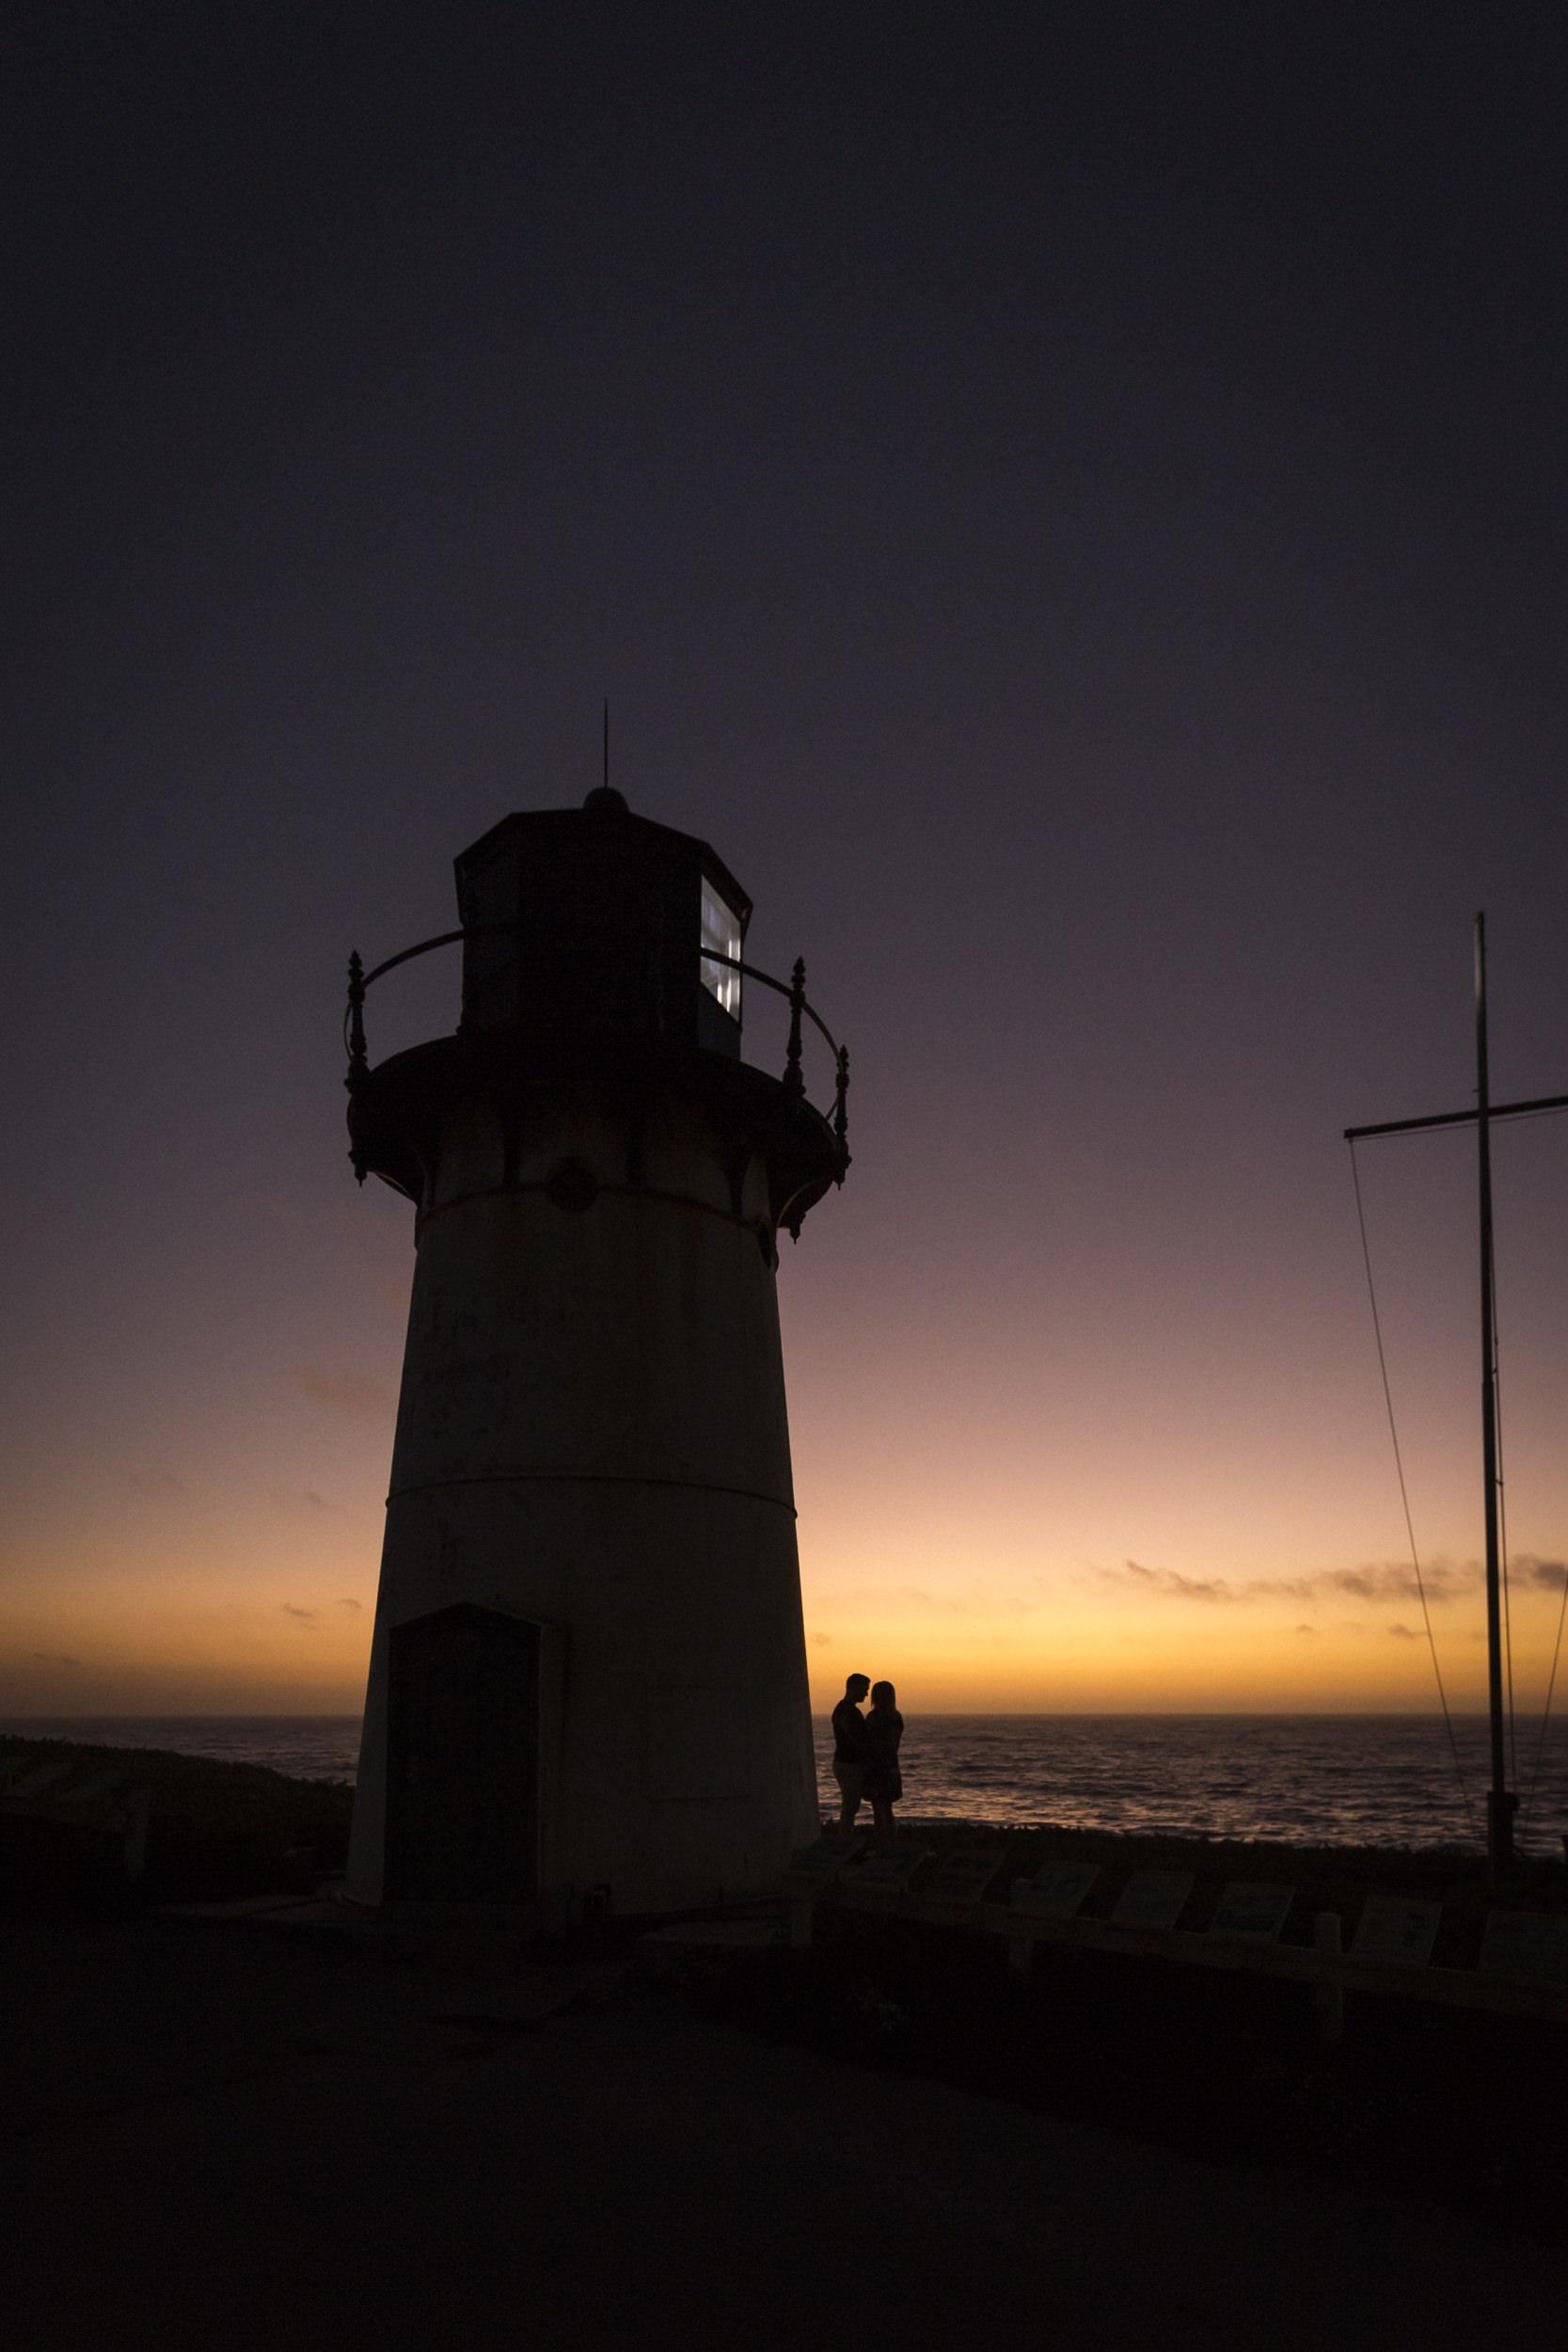 lighthouse-engagement-session-sunsete-california-1.jpg